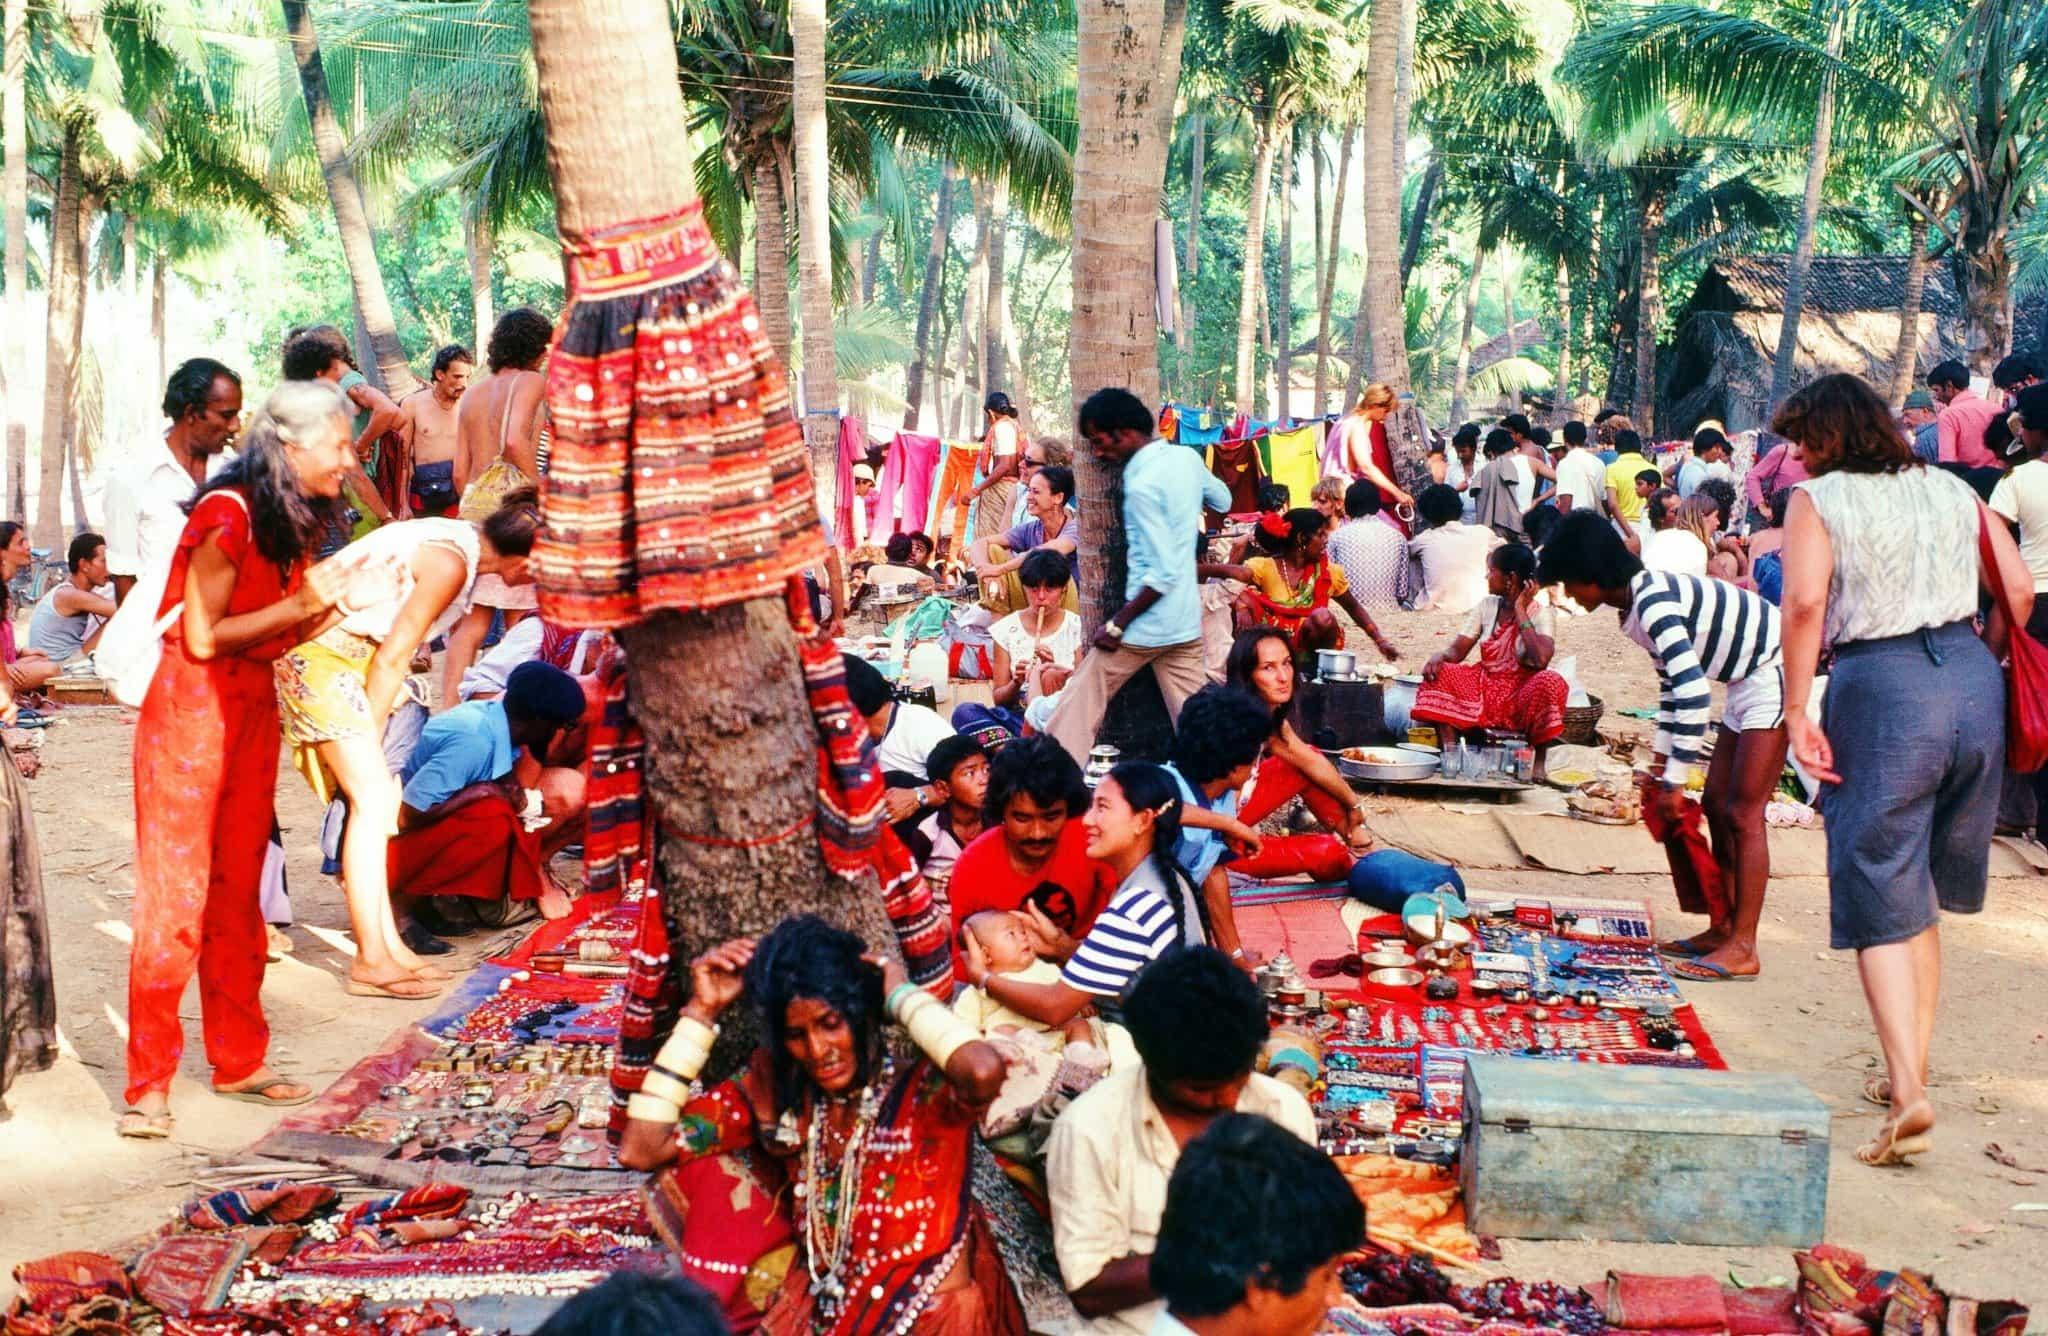 Anjuna flea market, Goa, 1982 (Photo credit unavailable).